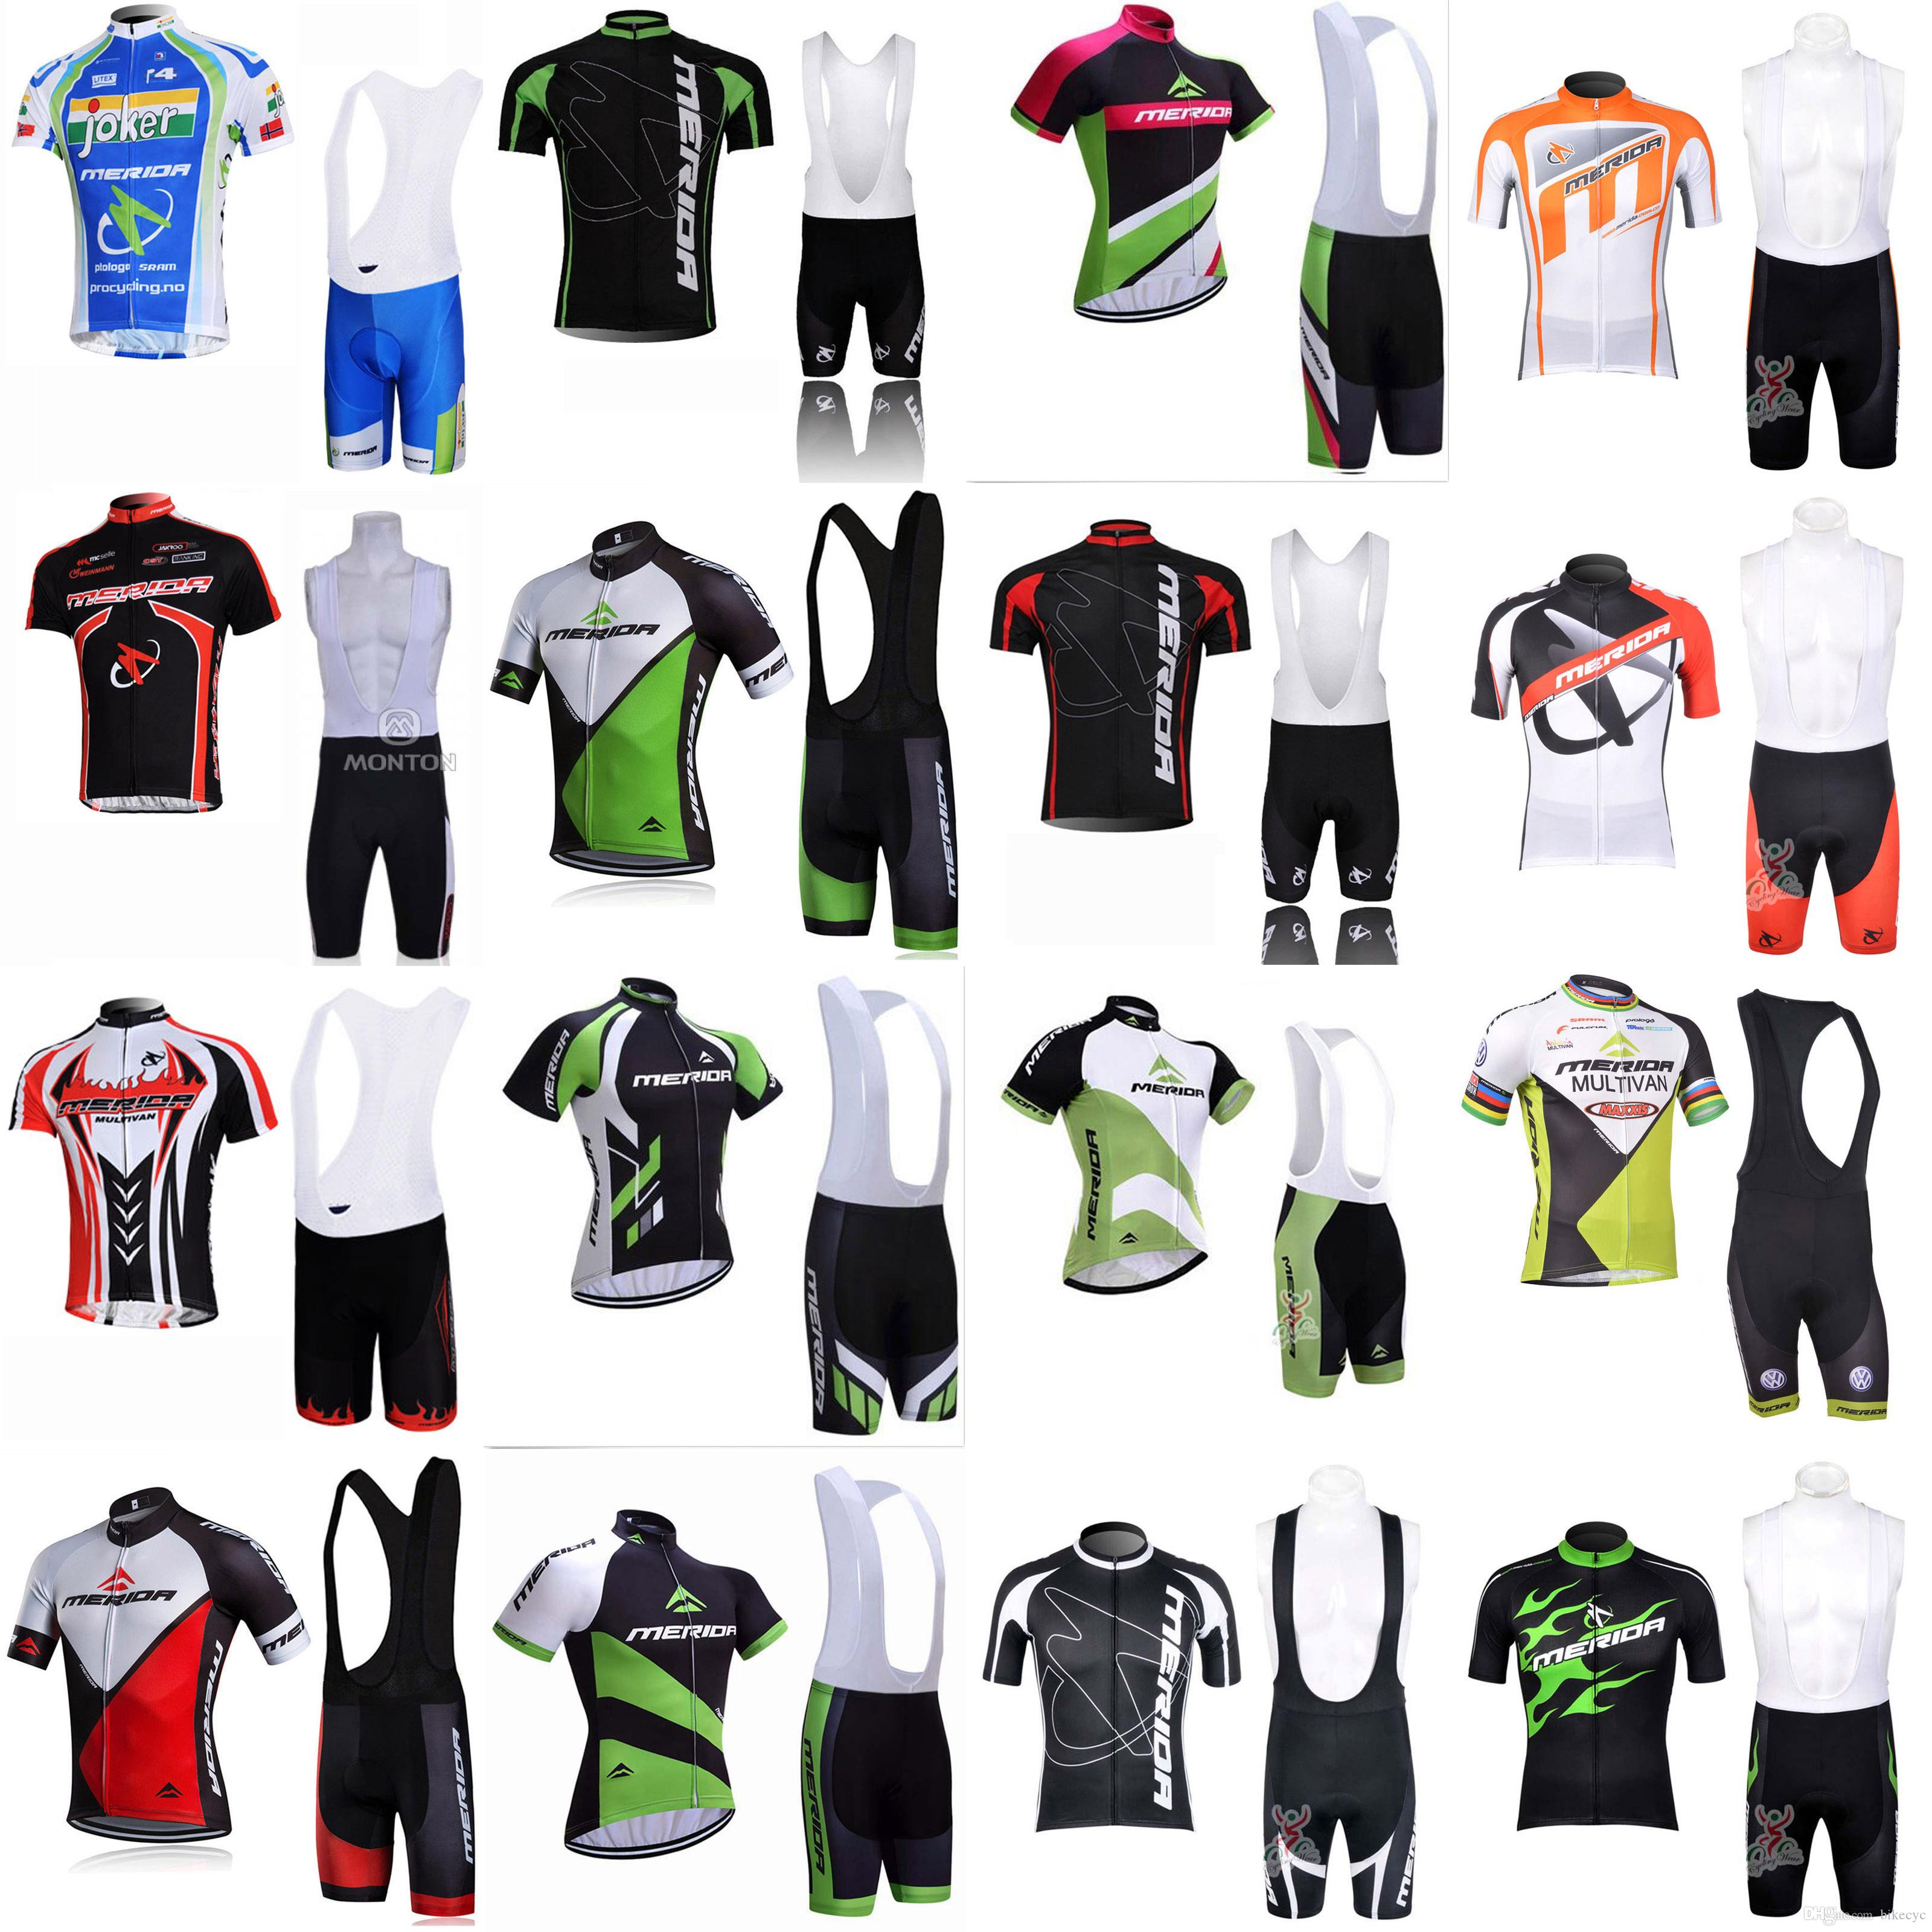 MERIDA Equipo Ciclismo Mangas cortas Jersey (babero) Shorts Sets Fin Thin Mountain Bike Seco Sport Wear C1914